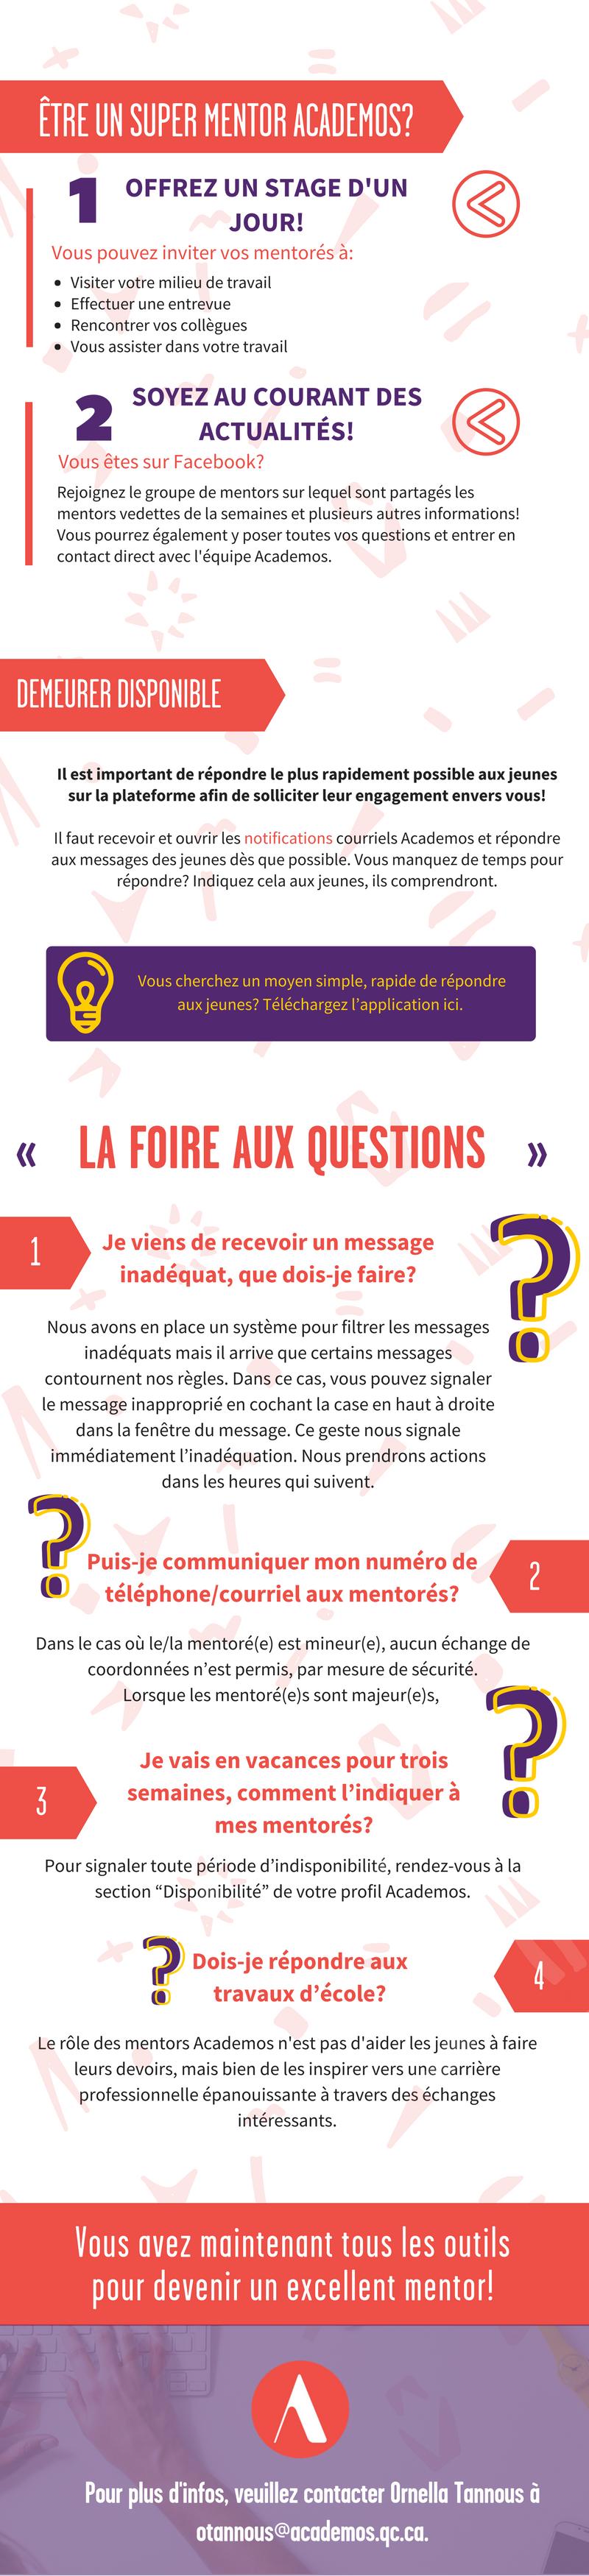 Kit du bon mentor 2 - Academos